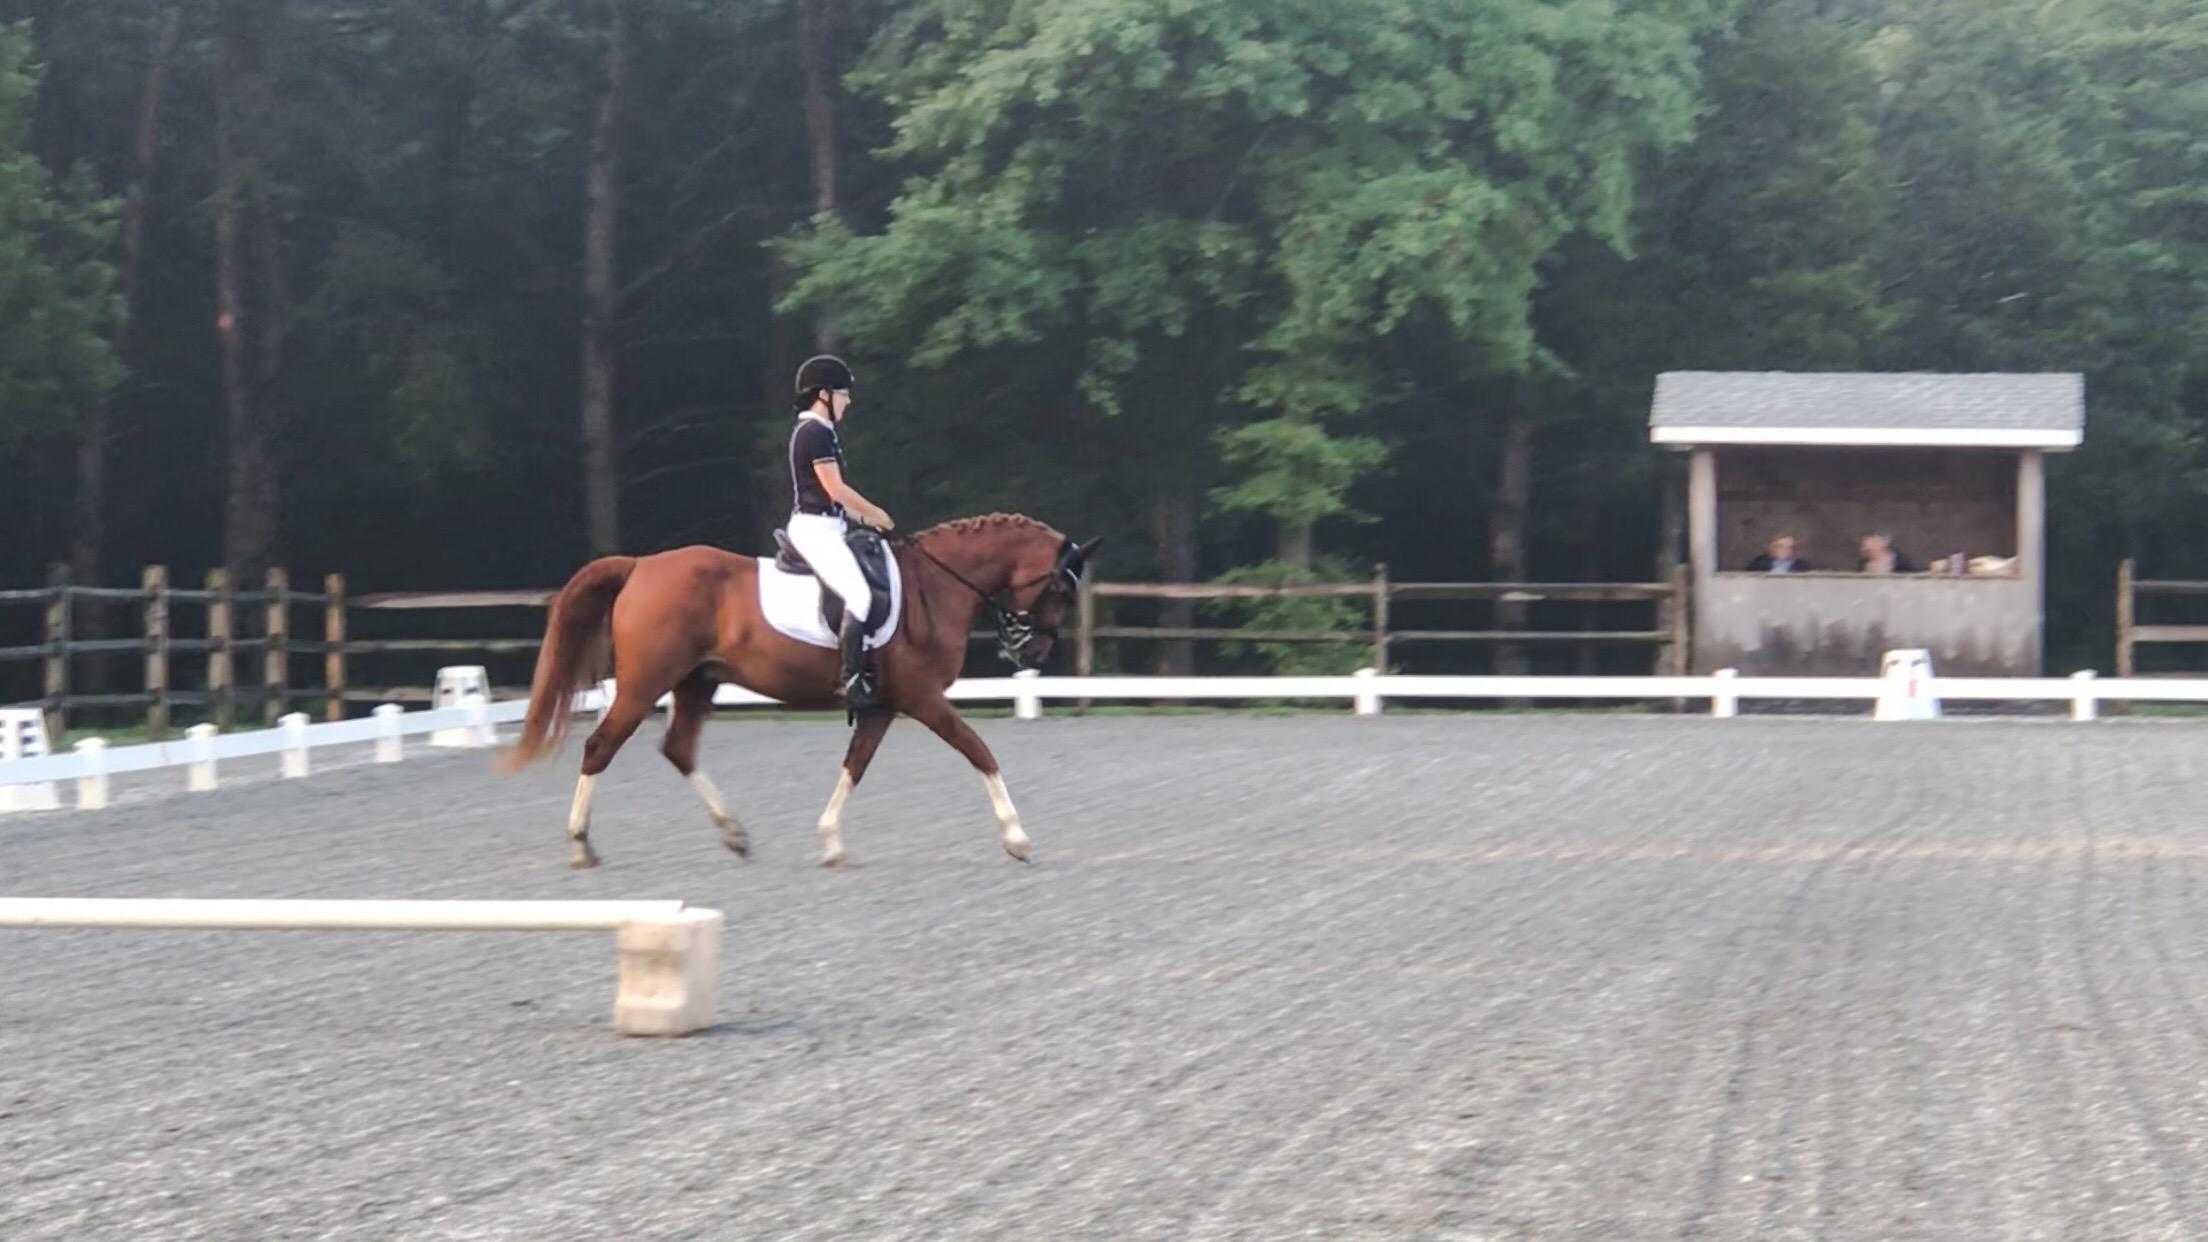 dressage rider paralysis horses